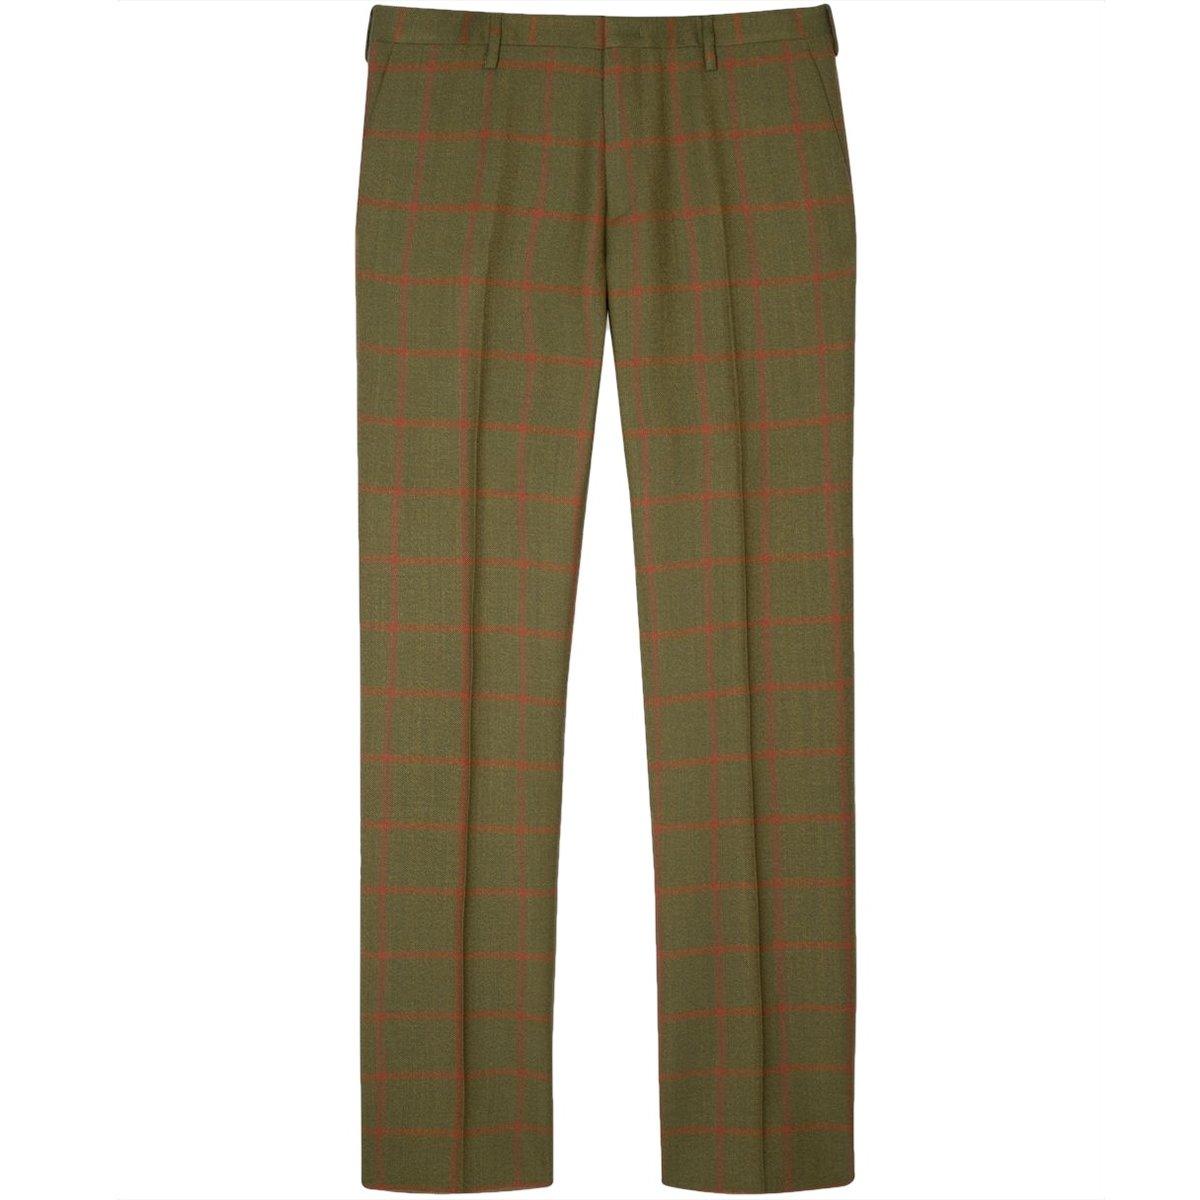 Paul Smith Windowpane Check Green Wool Pants.jpg